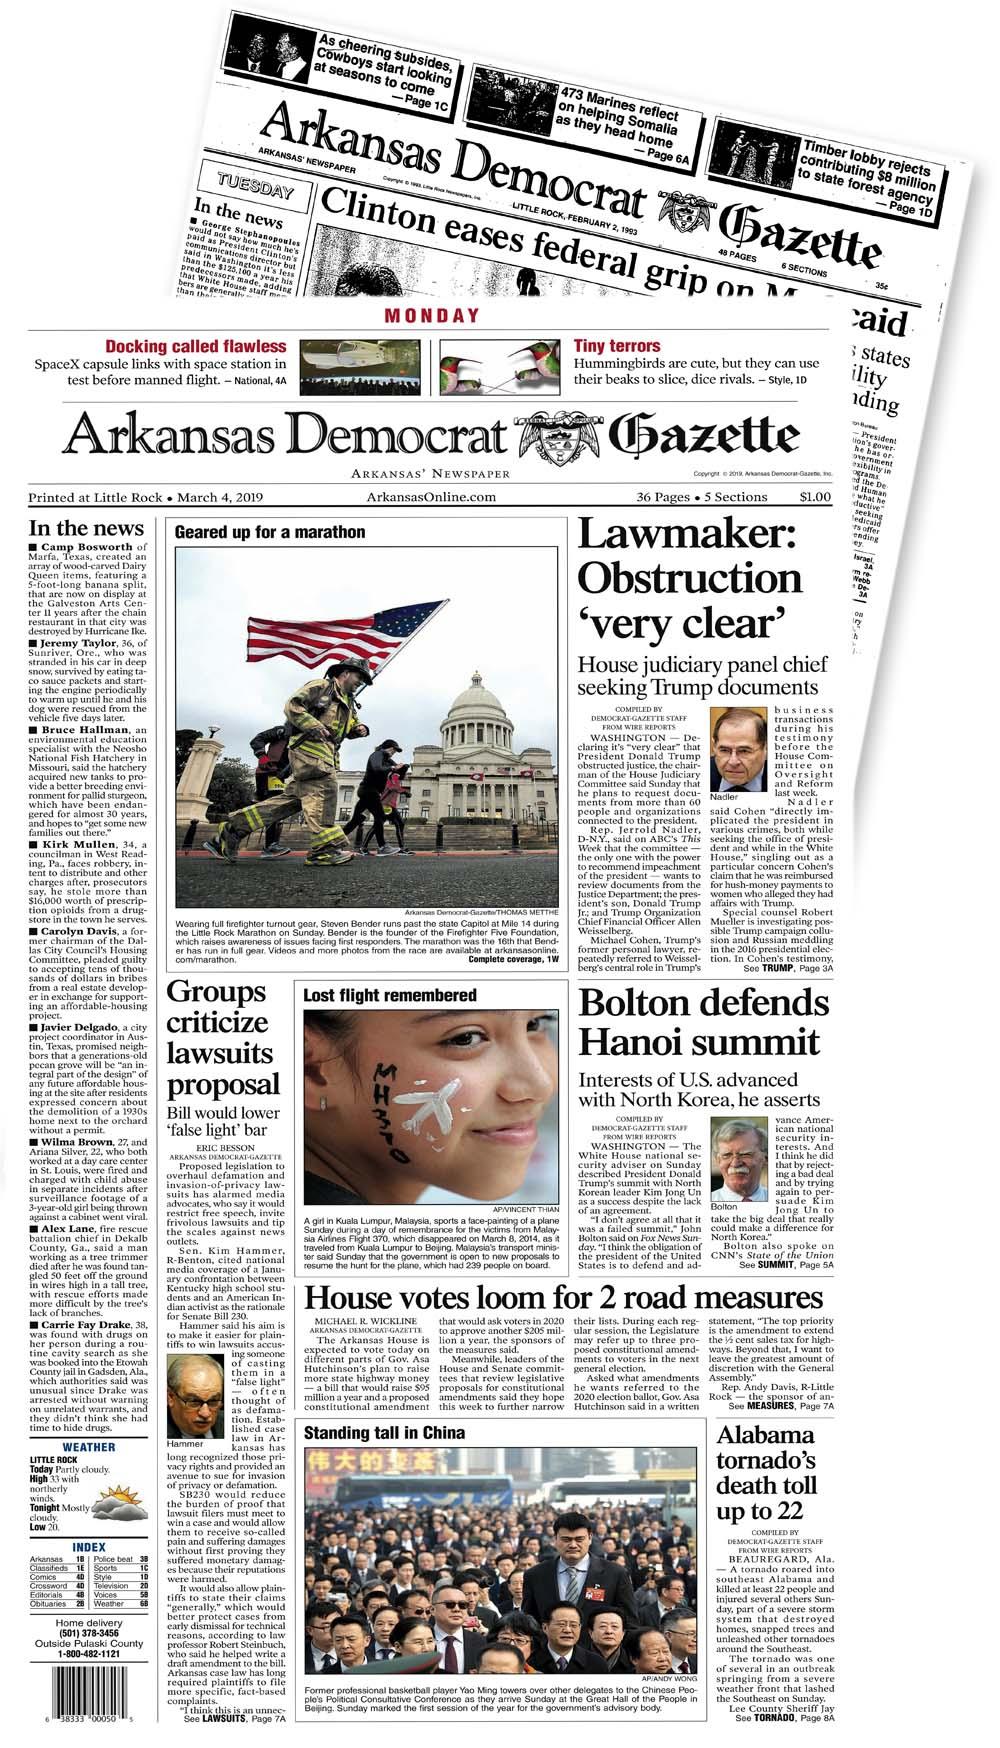 Welcome to the Arkansas Democrat-Gazette archives